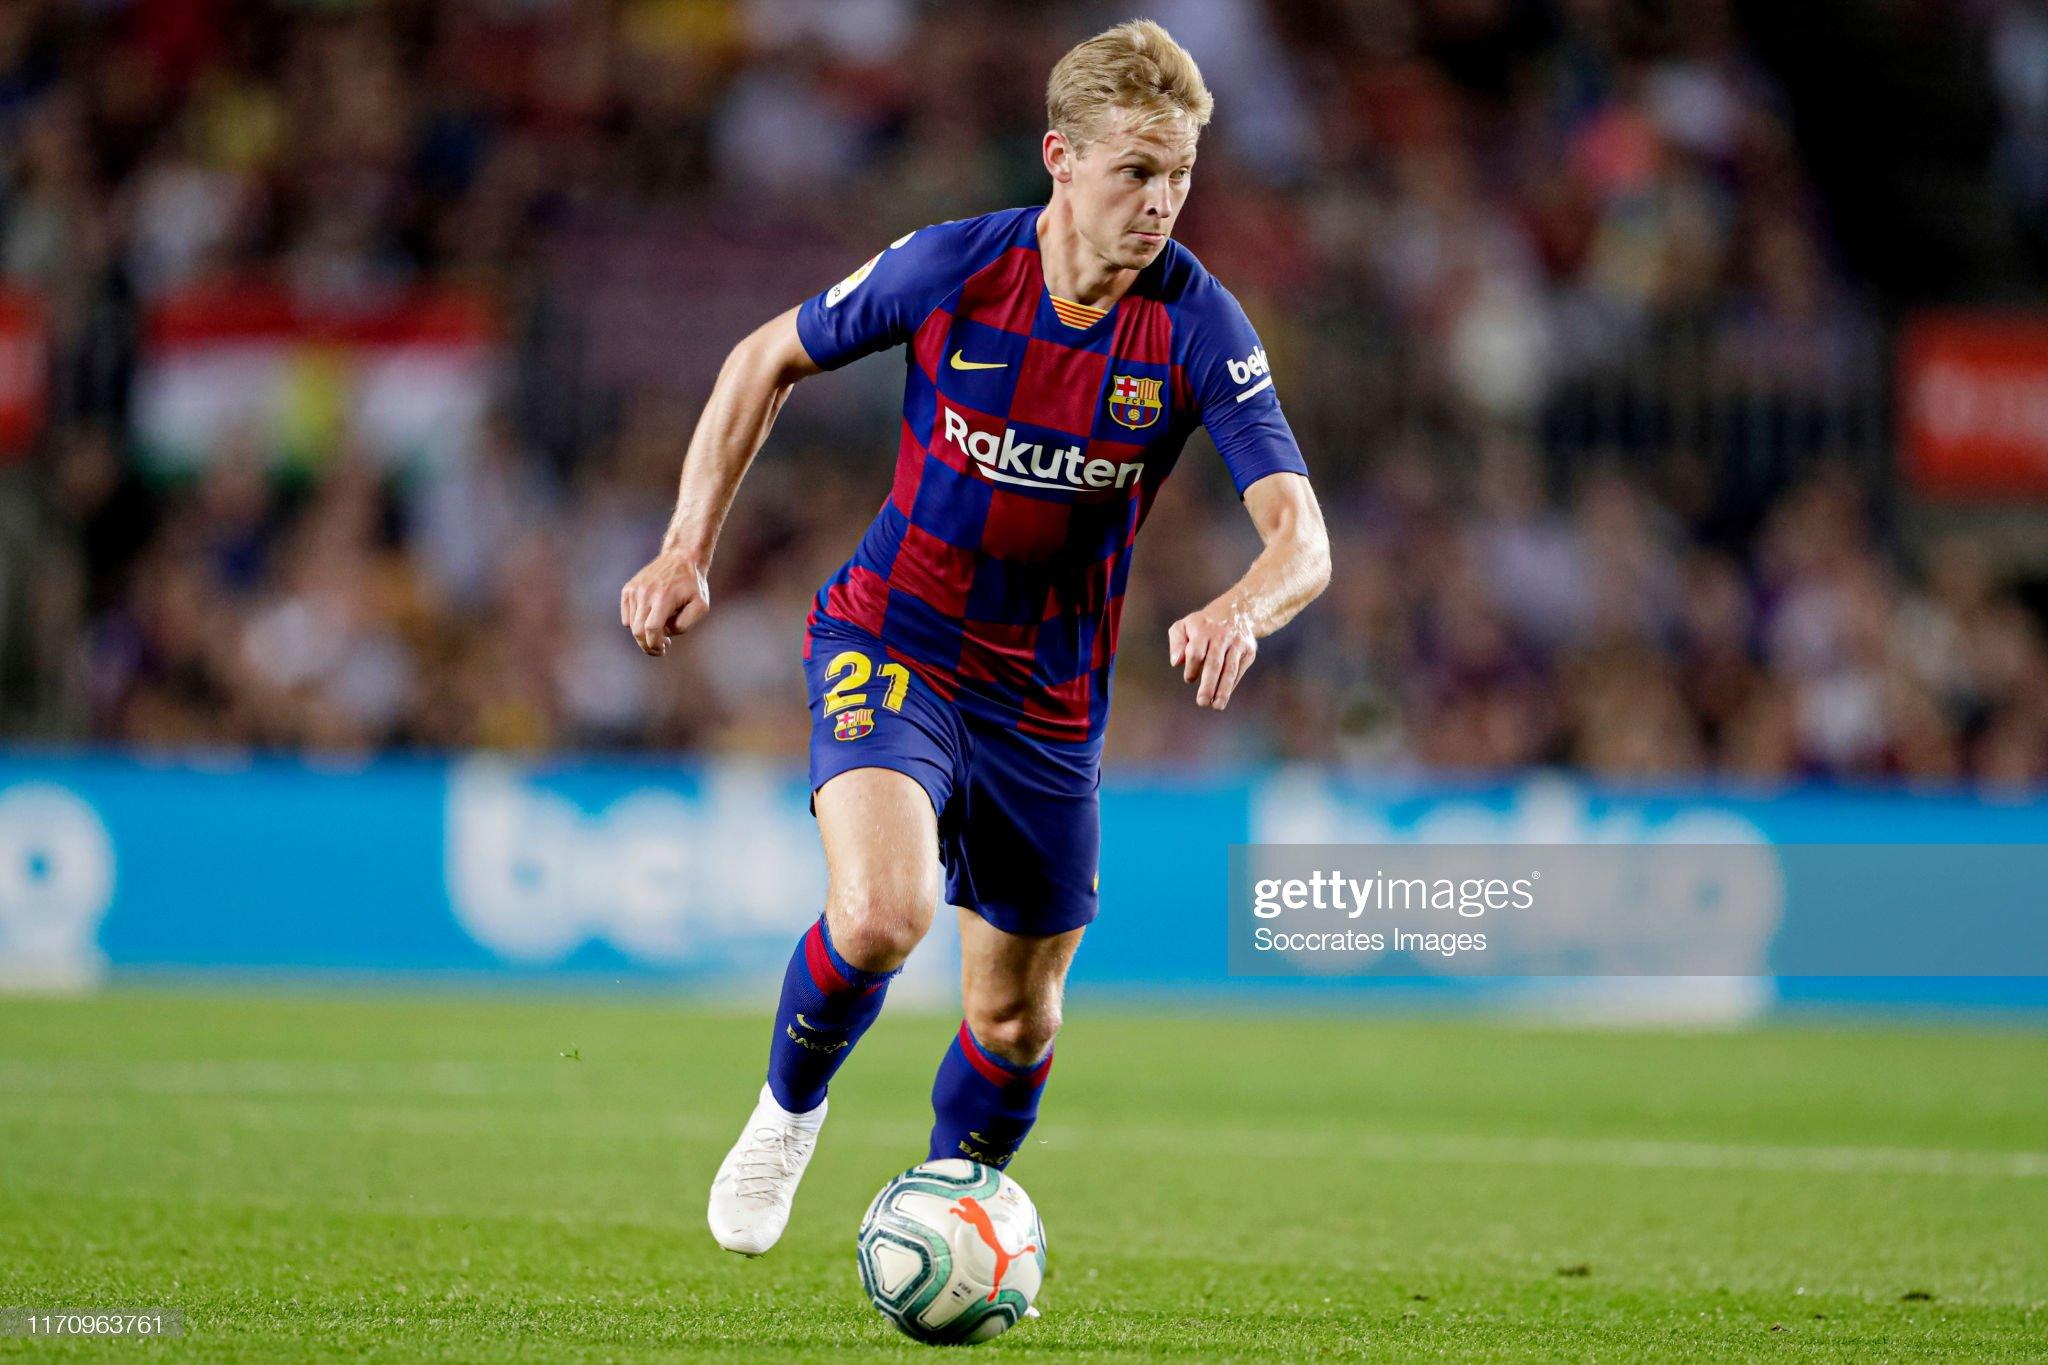 صور مباراة : برشلونة - فياريال 2-1 ( 24-09-2019 )  Frenkie-de-jong-of-fc-barcelona-during-the-la-liga-santander-match-picture-id1170963761?s=2048x2048